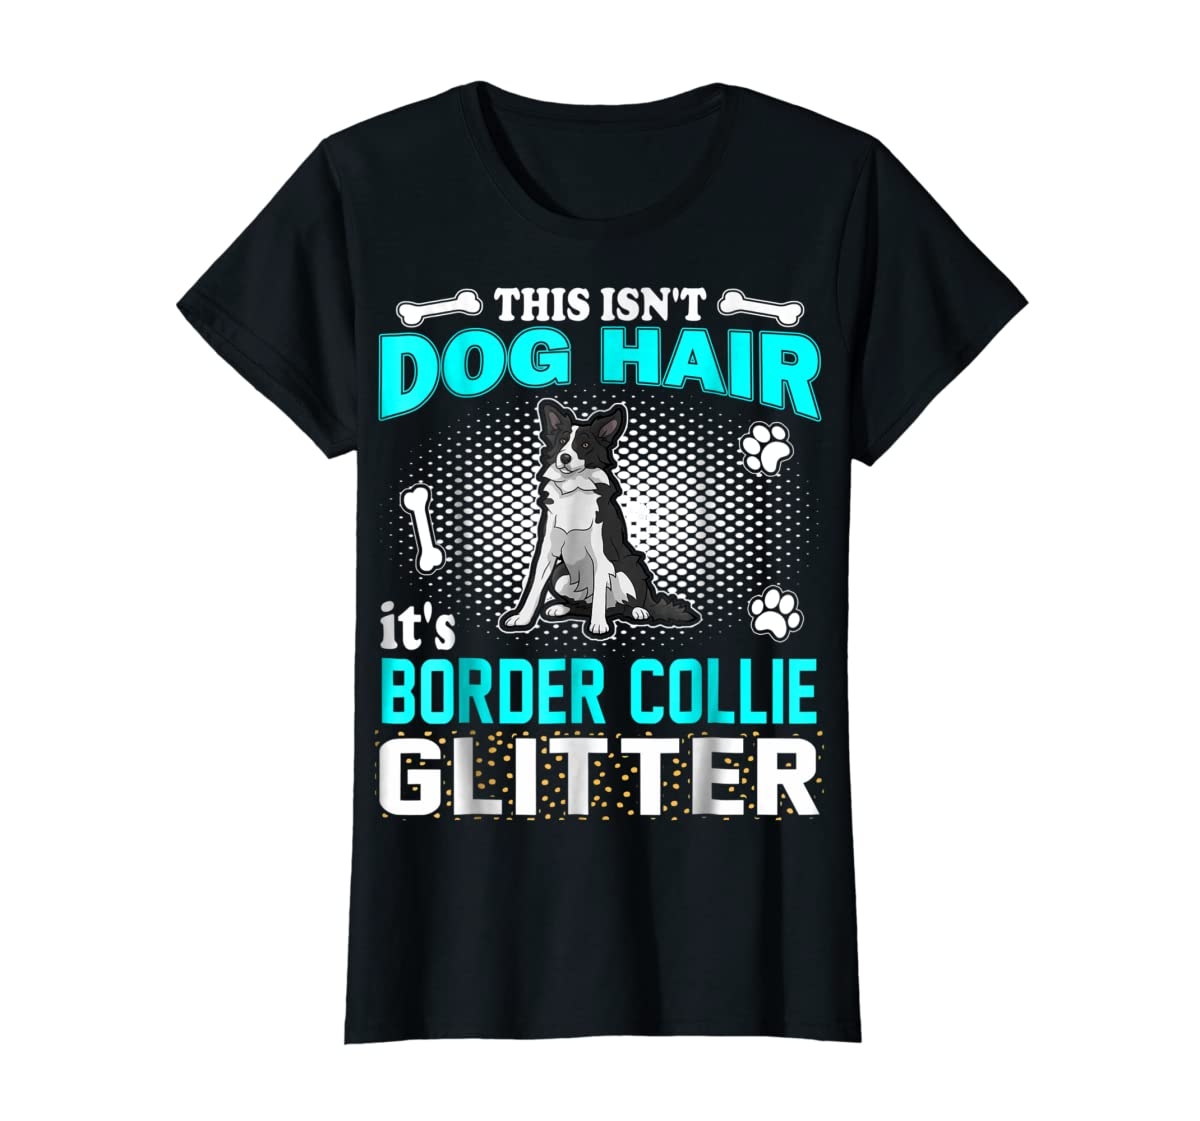 This Isn't Dog Hair It's Border Collie Glitter T-Shirt-Women's T-Shirt-Black